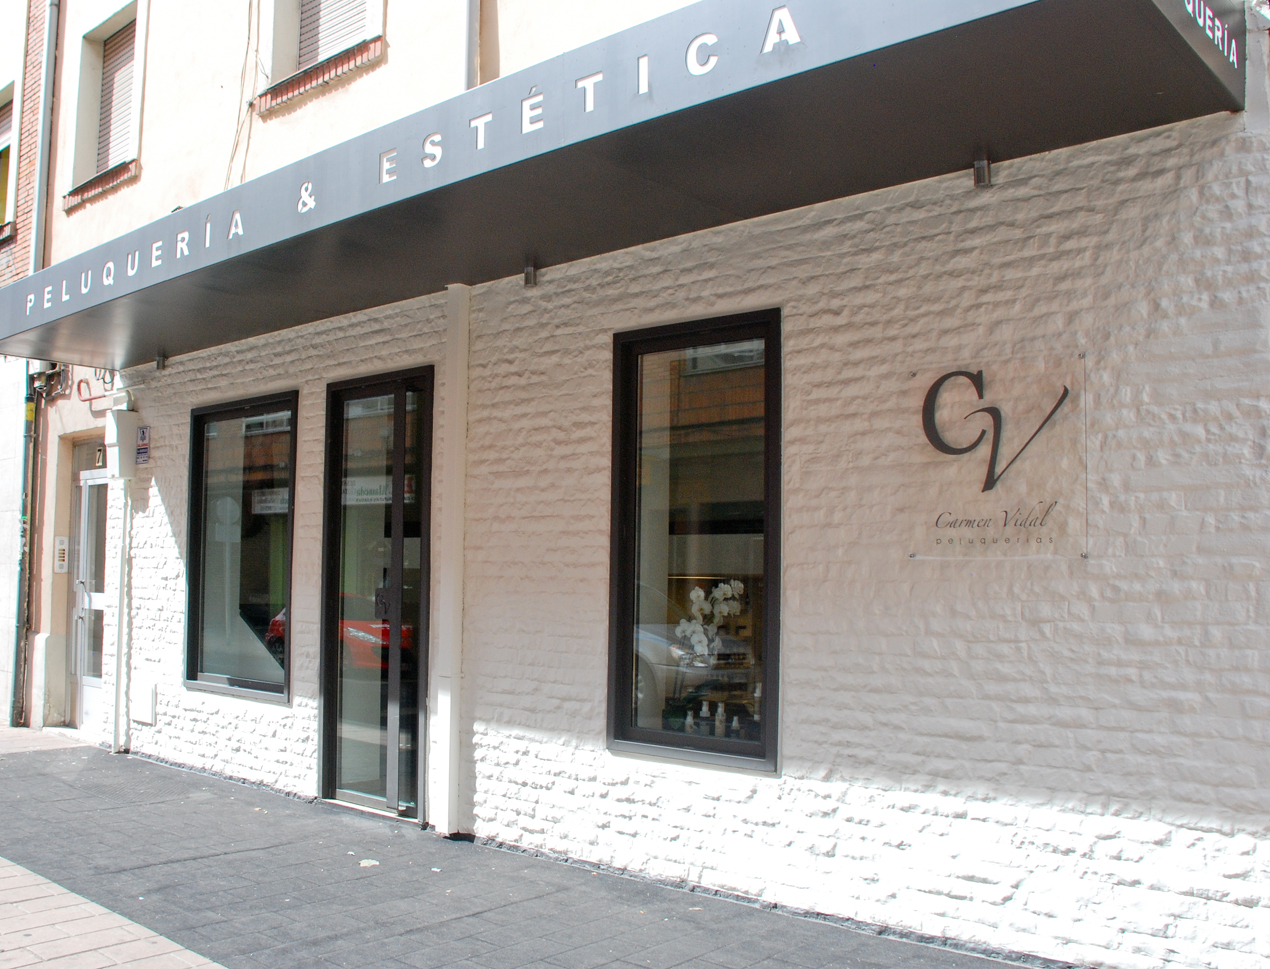 Carmen vidal peluquer as el centro - Fachadas de peluquerias ...